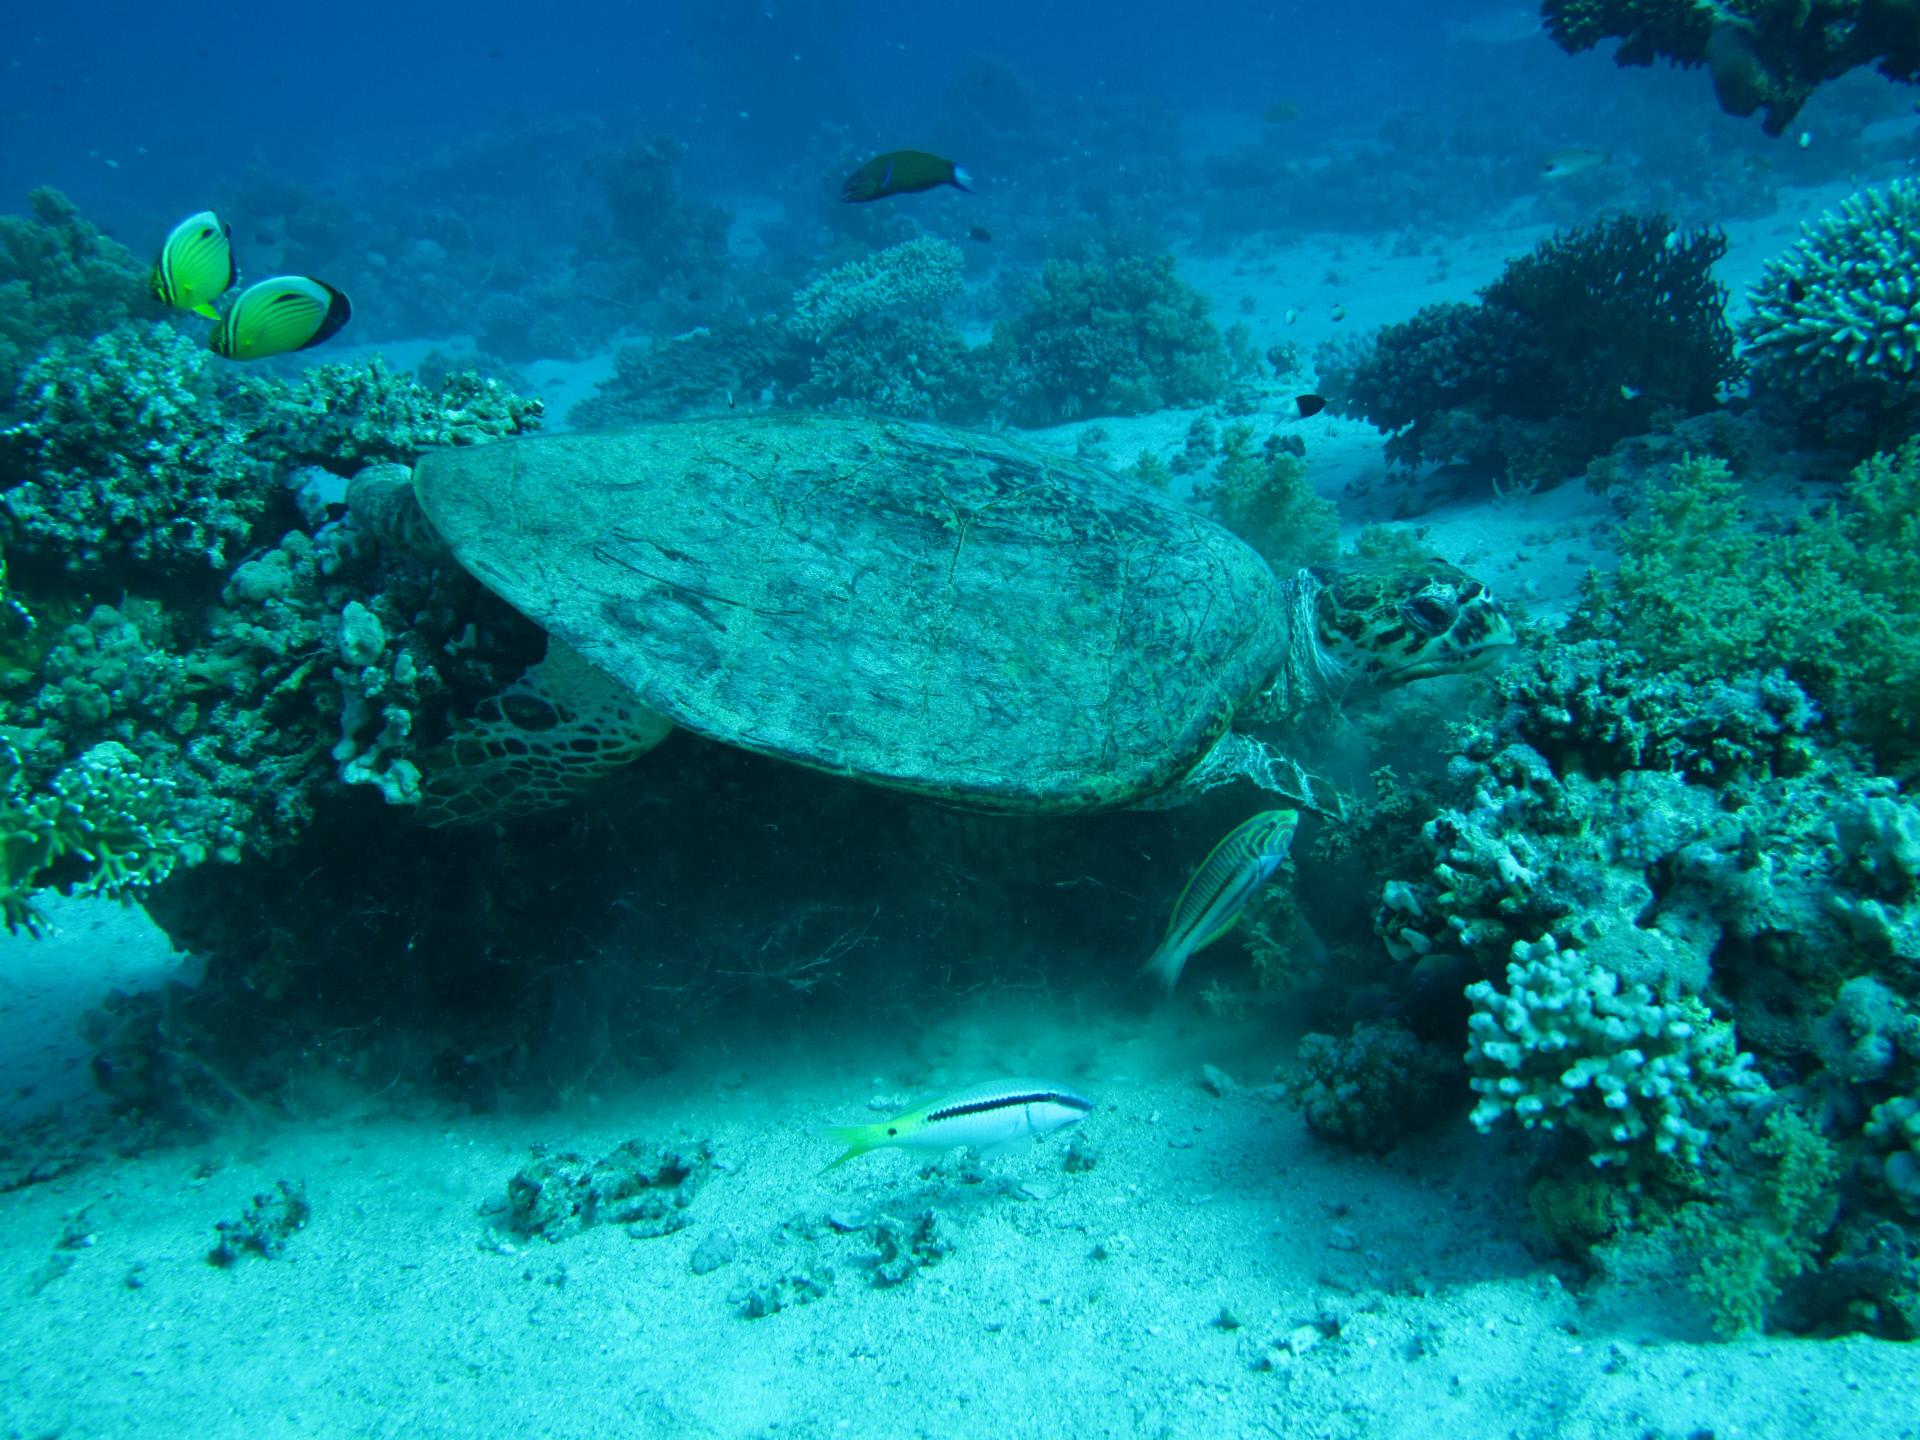 Una tartaruga nelle acque delle Isole Galapagos / Gtres